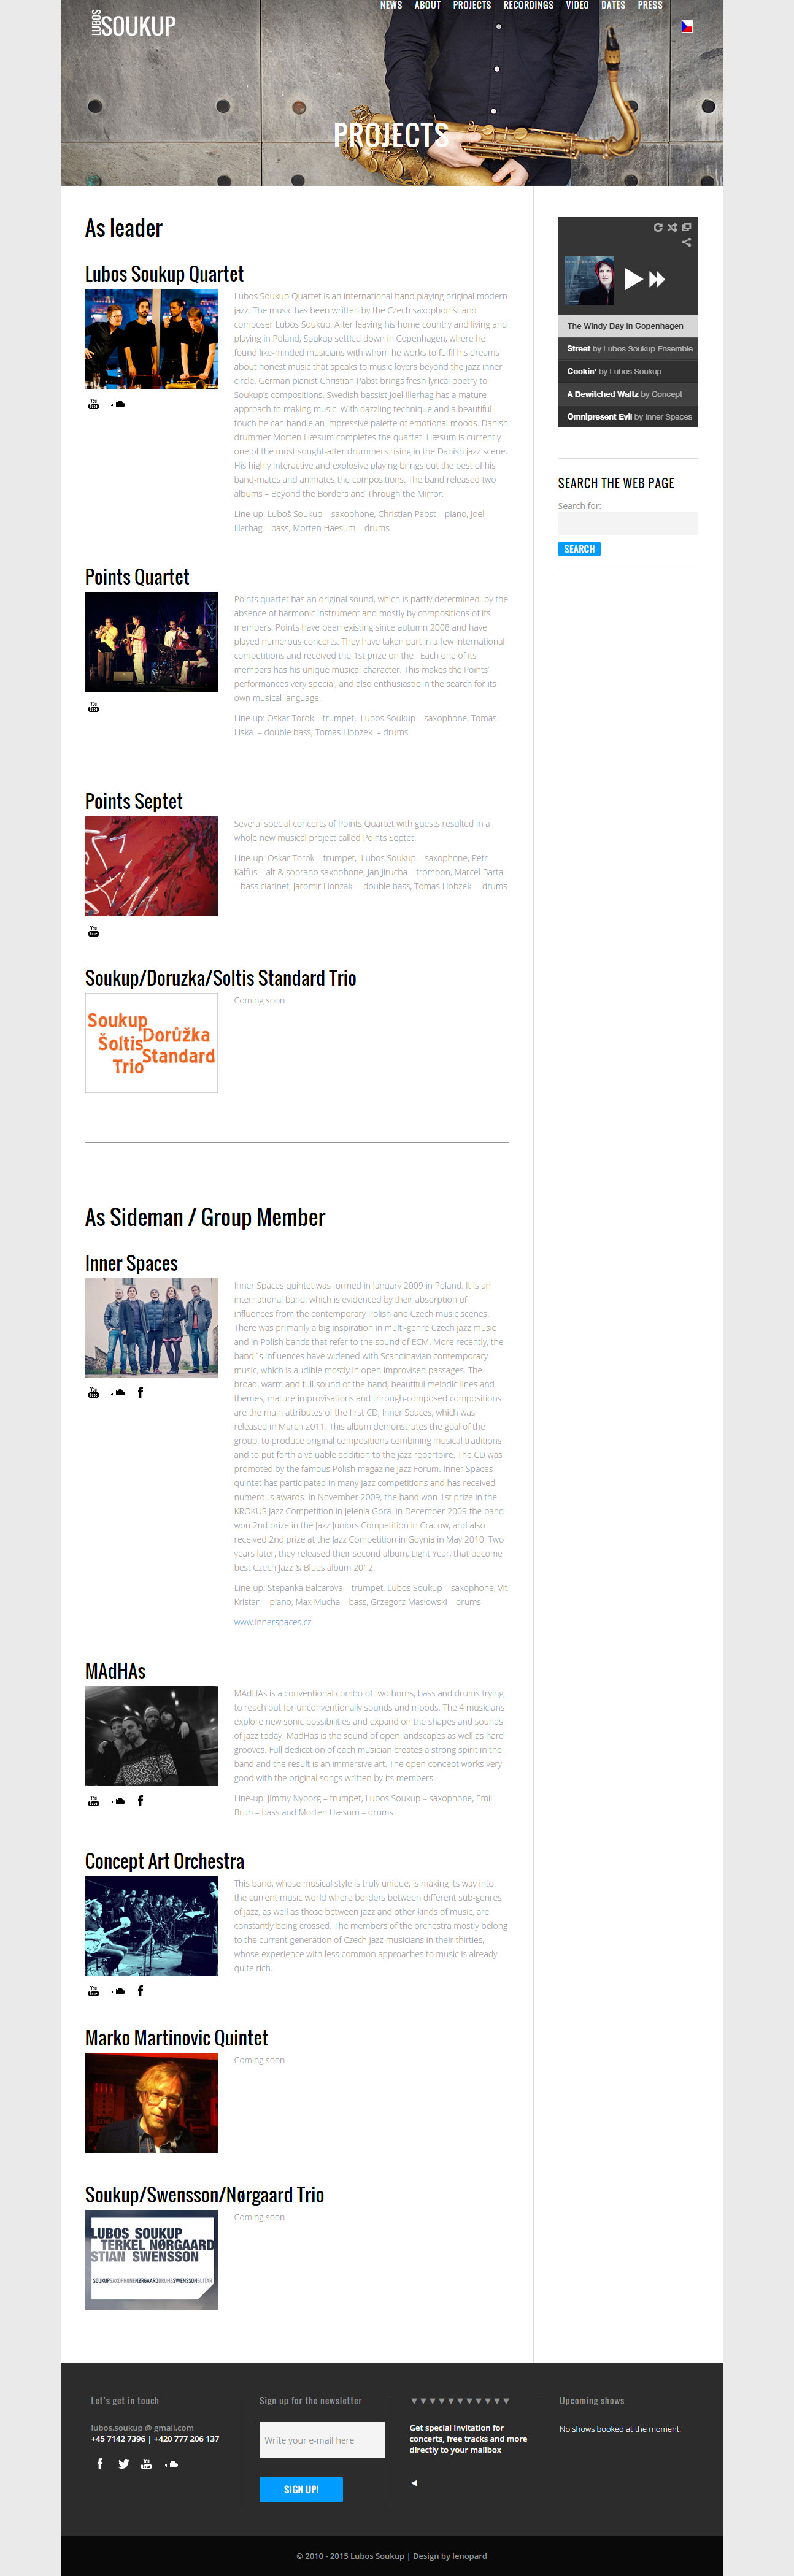 lubossoukup.com, responsive web design, mobile, tablet, laptop, music, musician, jazz, Copenhagen, Prague, Czech republic, Denmark, Search Engine Optimization, SEO, RWD, Lubos Soukup, layout